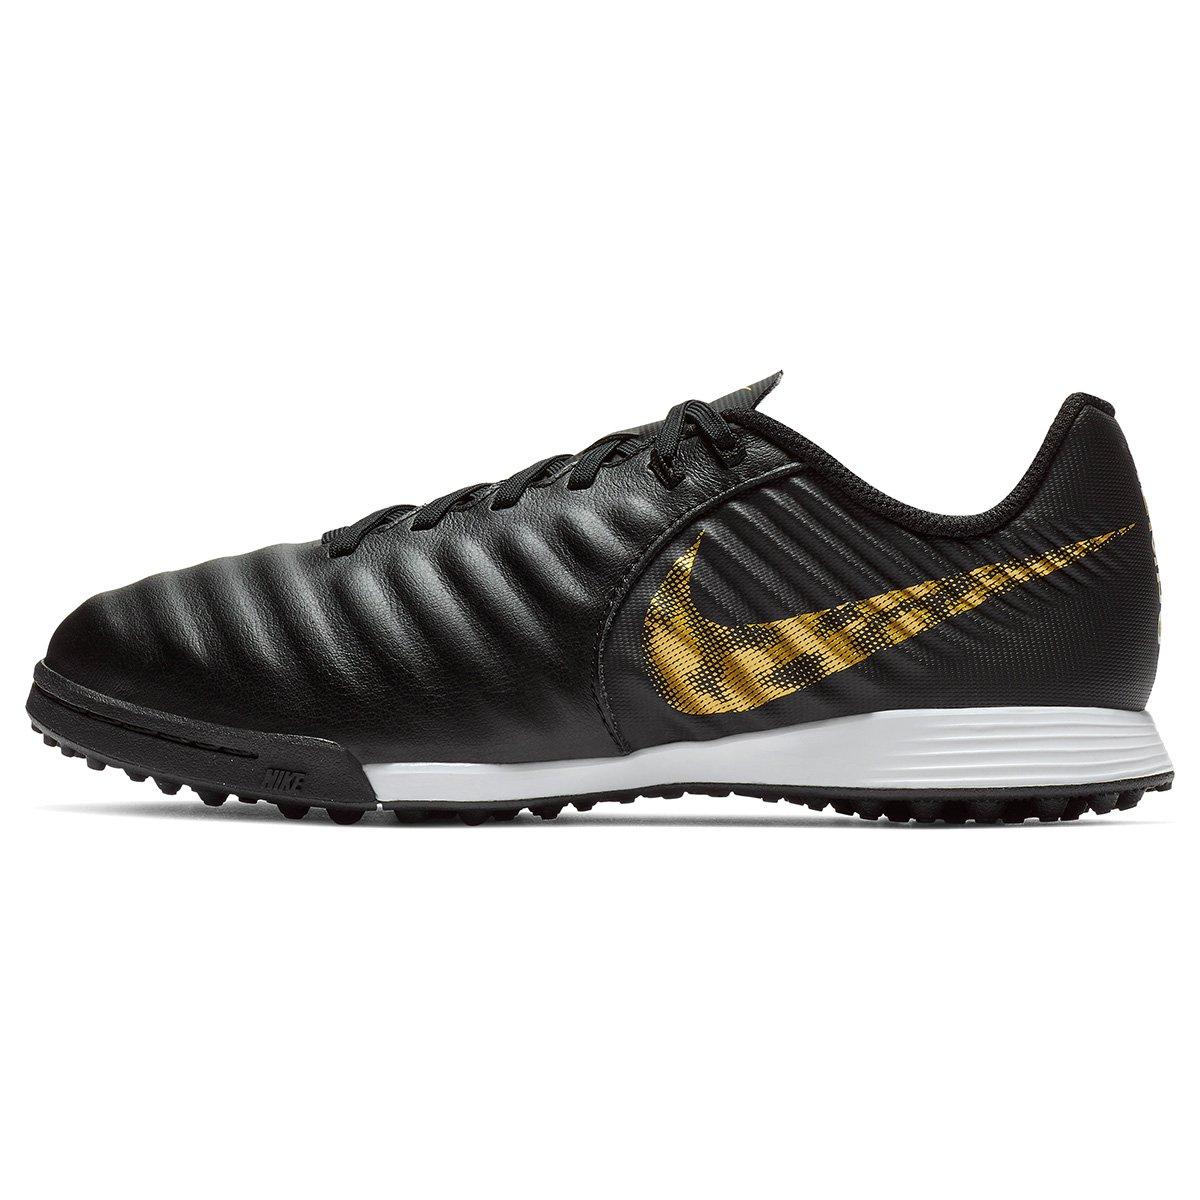 30aa00f0f Chuteira Society Infantil Nike Tiempo Legend 7 Academy TF - Compre Agora